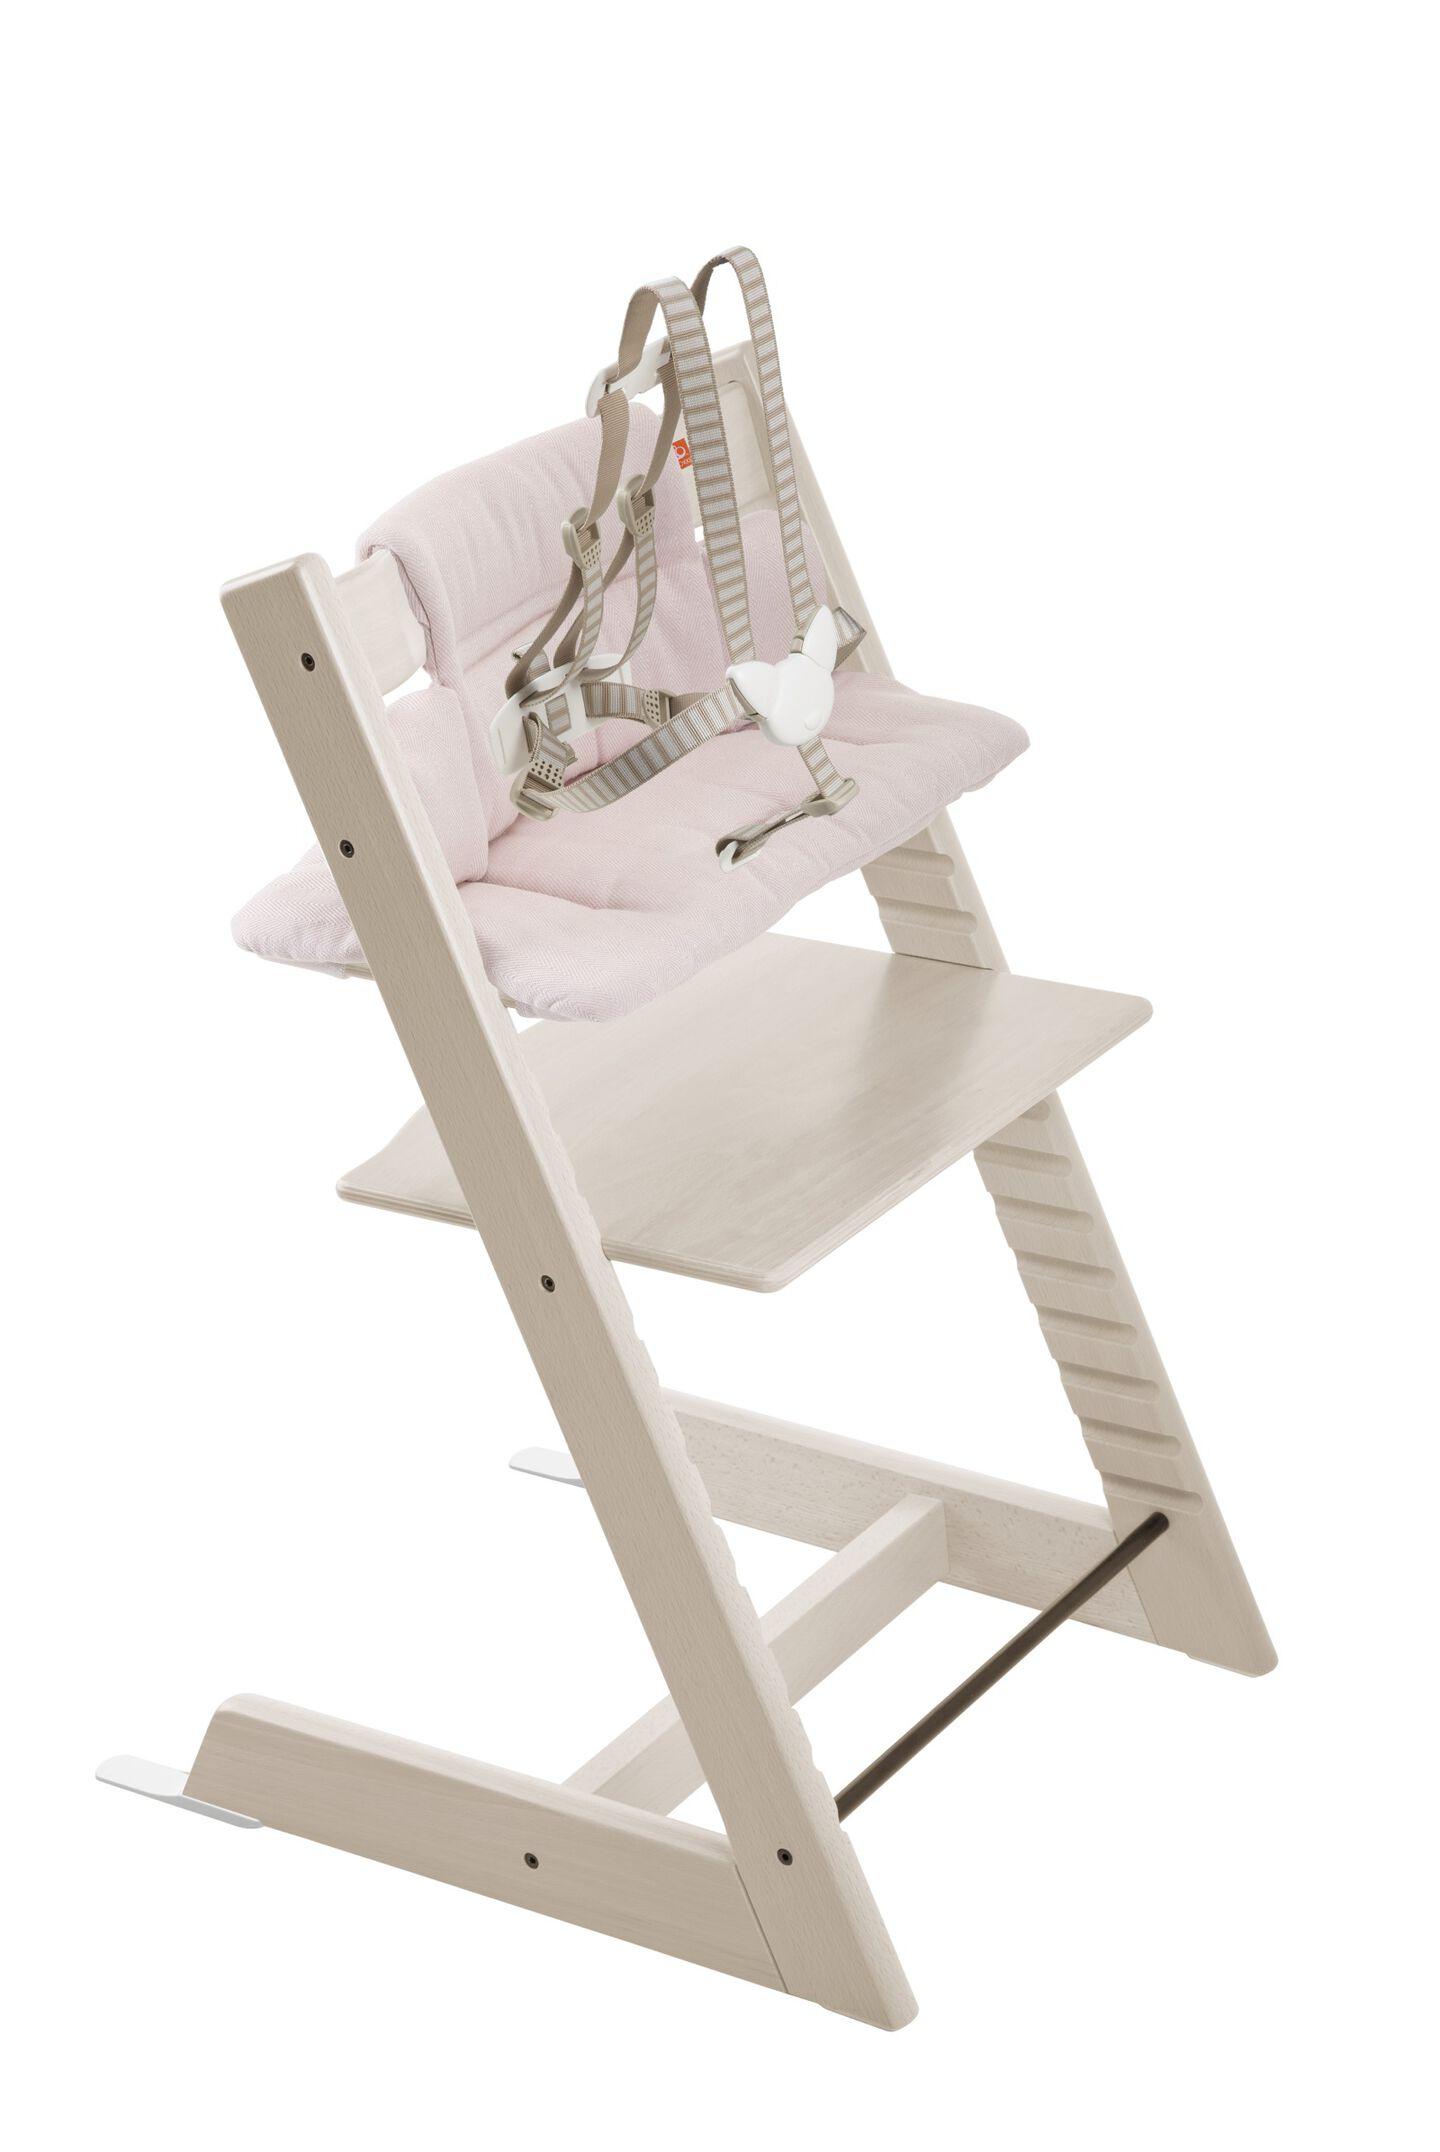 Tripp Trapp® Whitewash with Pink Tweed cushion.